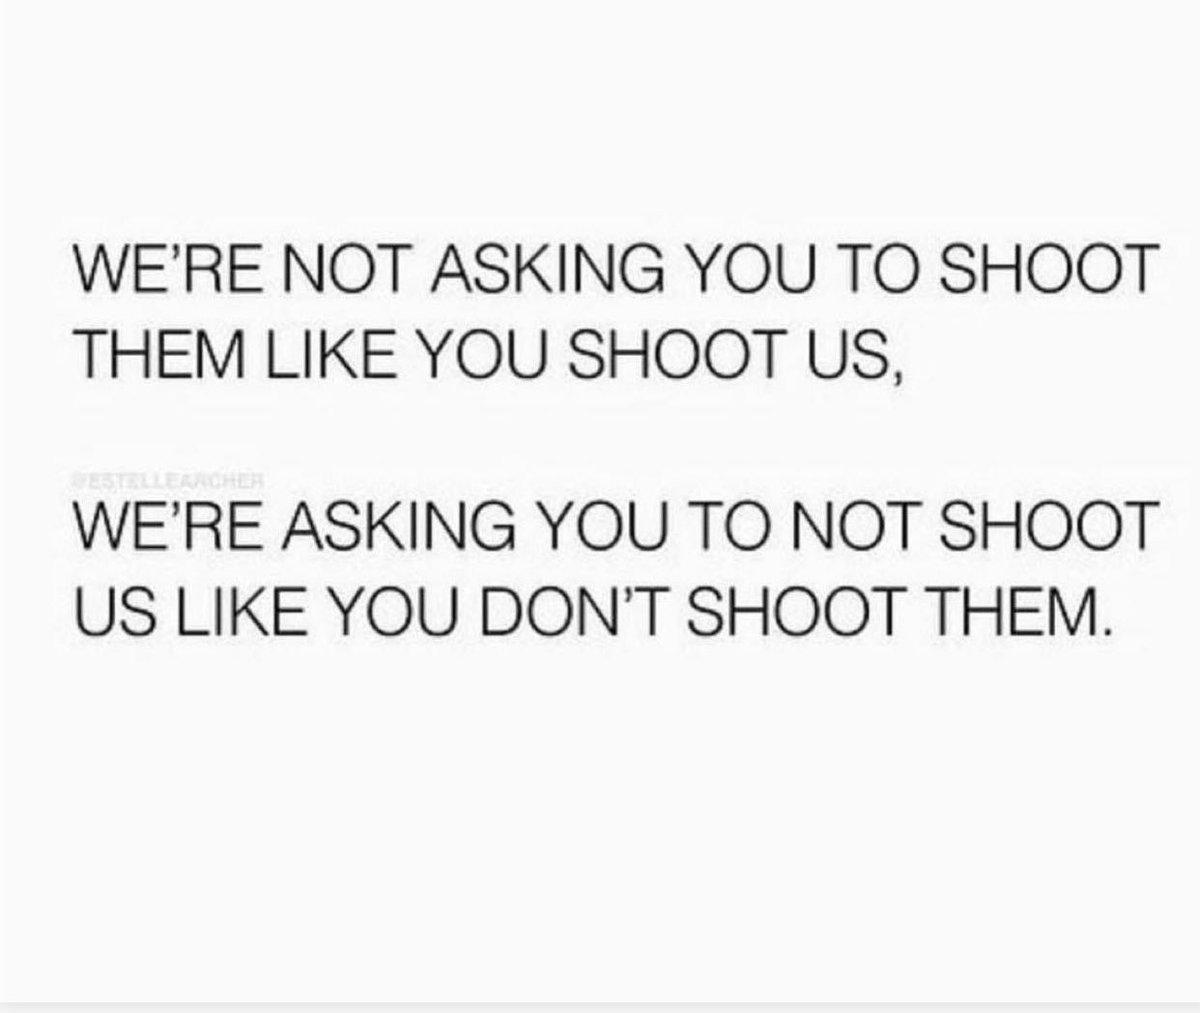 The hypocrisy is LOUD https://t.co/BQROTQZ1OV